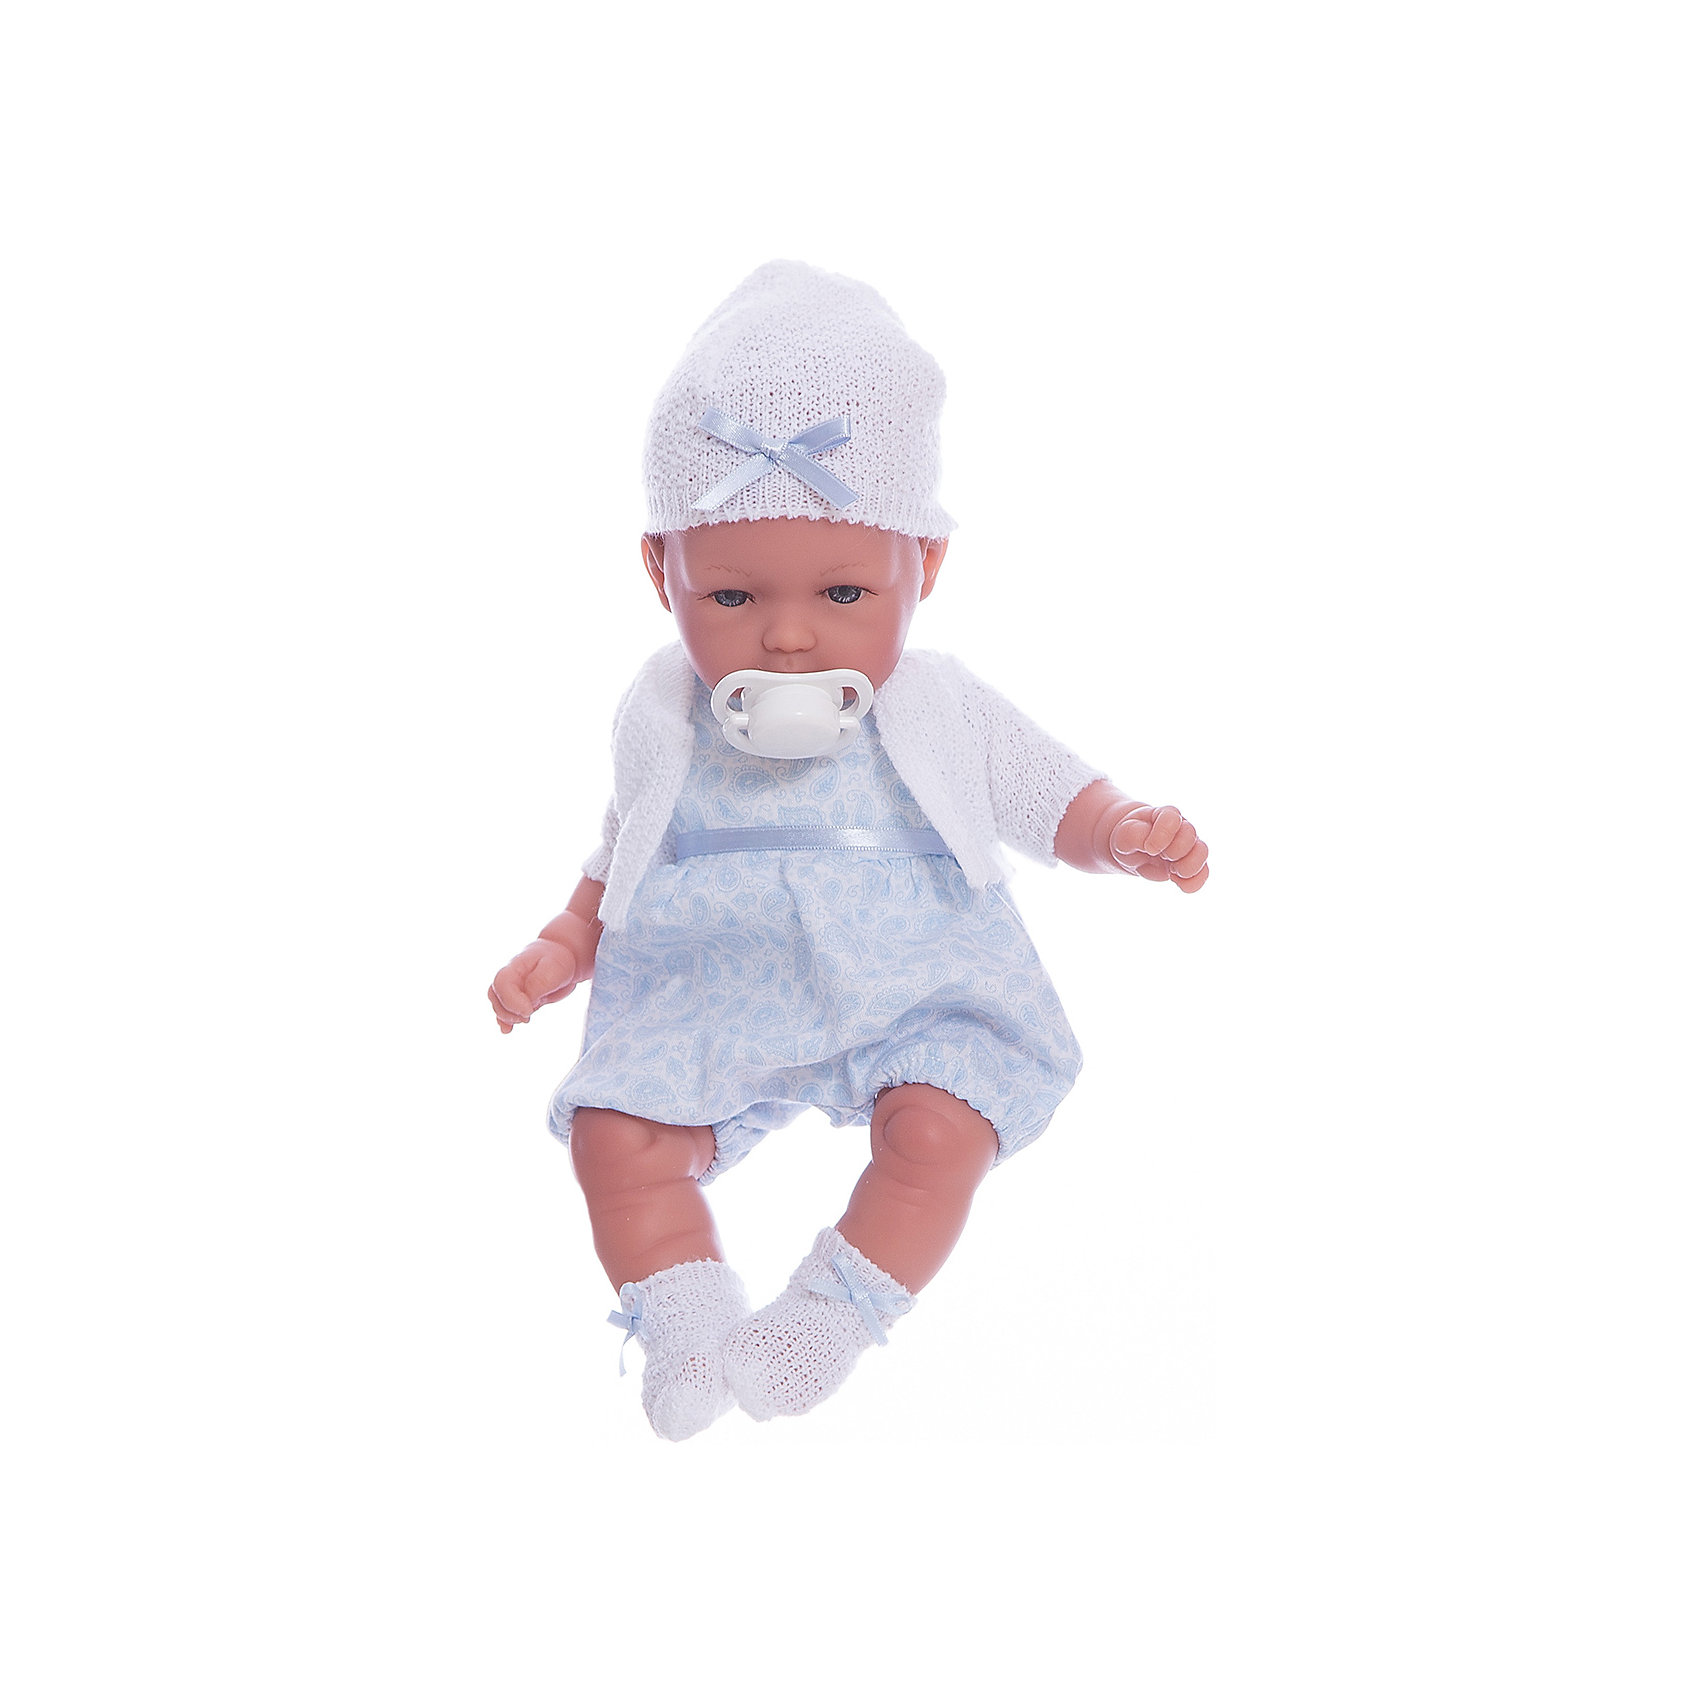 Кукла Vestida de Azul Томи в голубом костюмеКуклы-пупсы<br><br><br>Ширина мм: 380<br>Глубина мм: 120<br>Высота мм: 240<br>Вес г: 450<br>Возраст от месяцев: 36<br>Возраст до месяцев: 2147483647<br>Пол: Женский<br>Возраст: Детский<br>SKU: 7073757